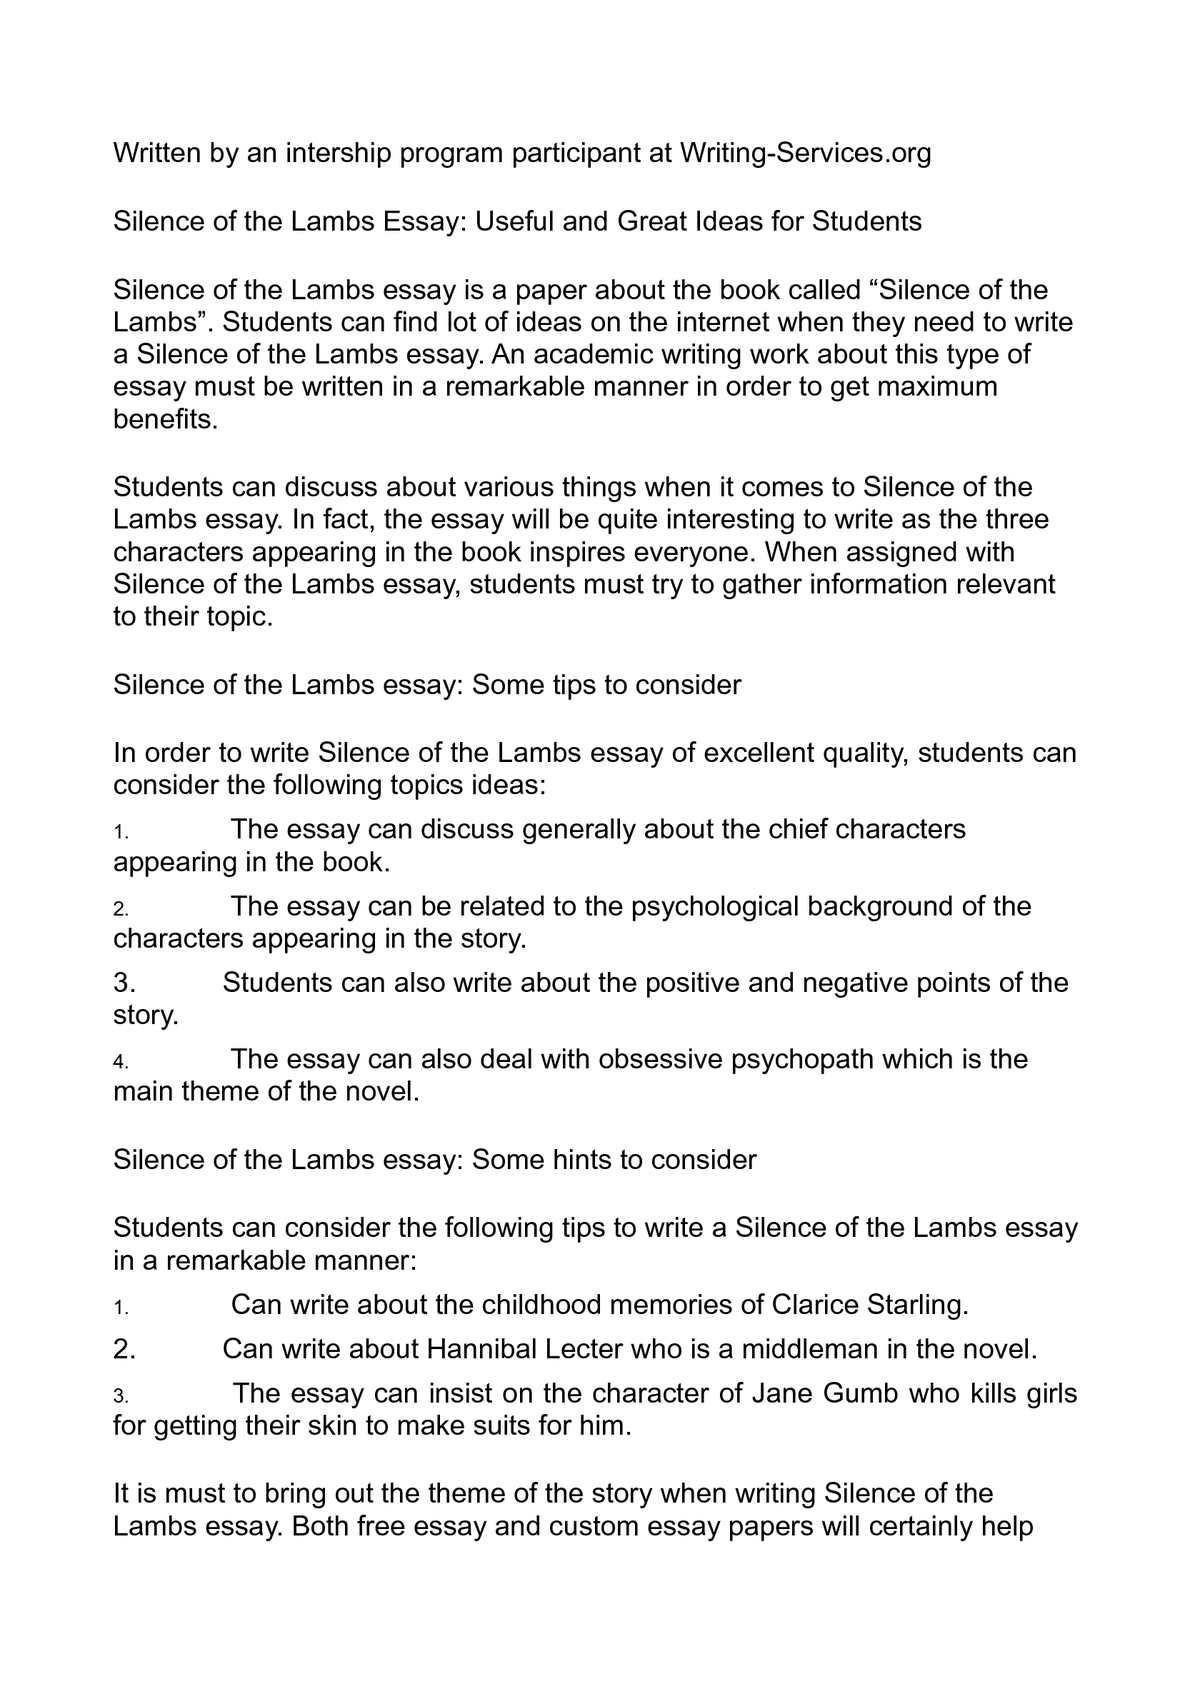 Calamo  Silence Of The Lambs Essay Useful And Great Ideas For  Calamo  Silence Of The Lambs Essay Useful And Great Ideas For Students